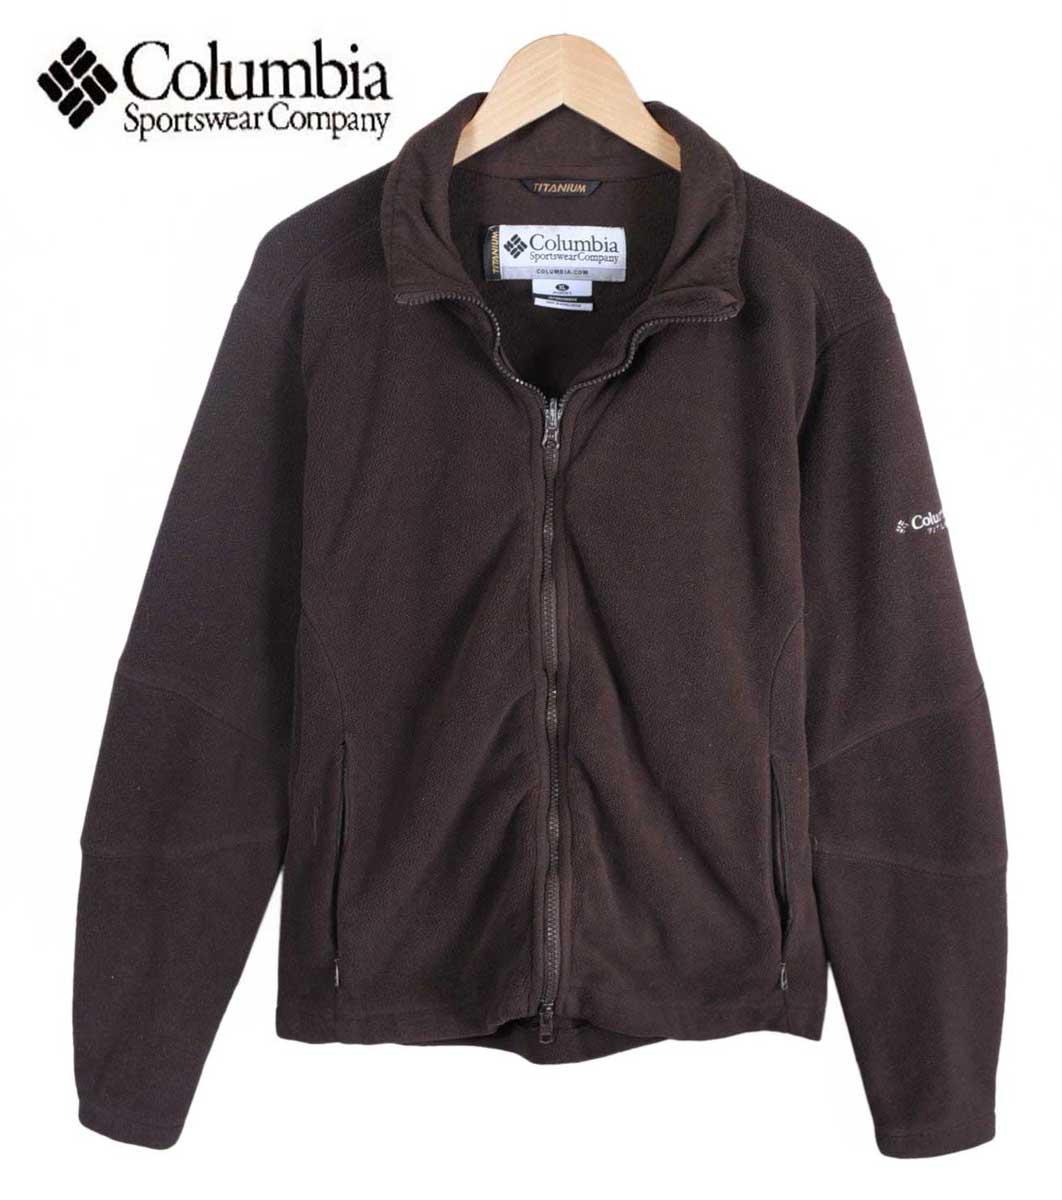 USED CLOTHING PENGUINTRIPPER | Rakuten Global Market: Columbia ...